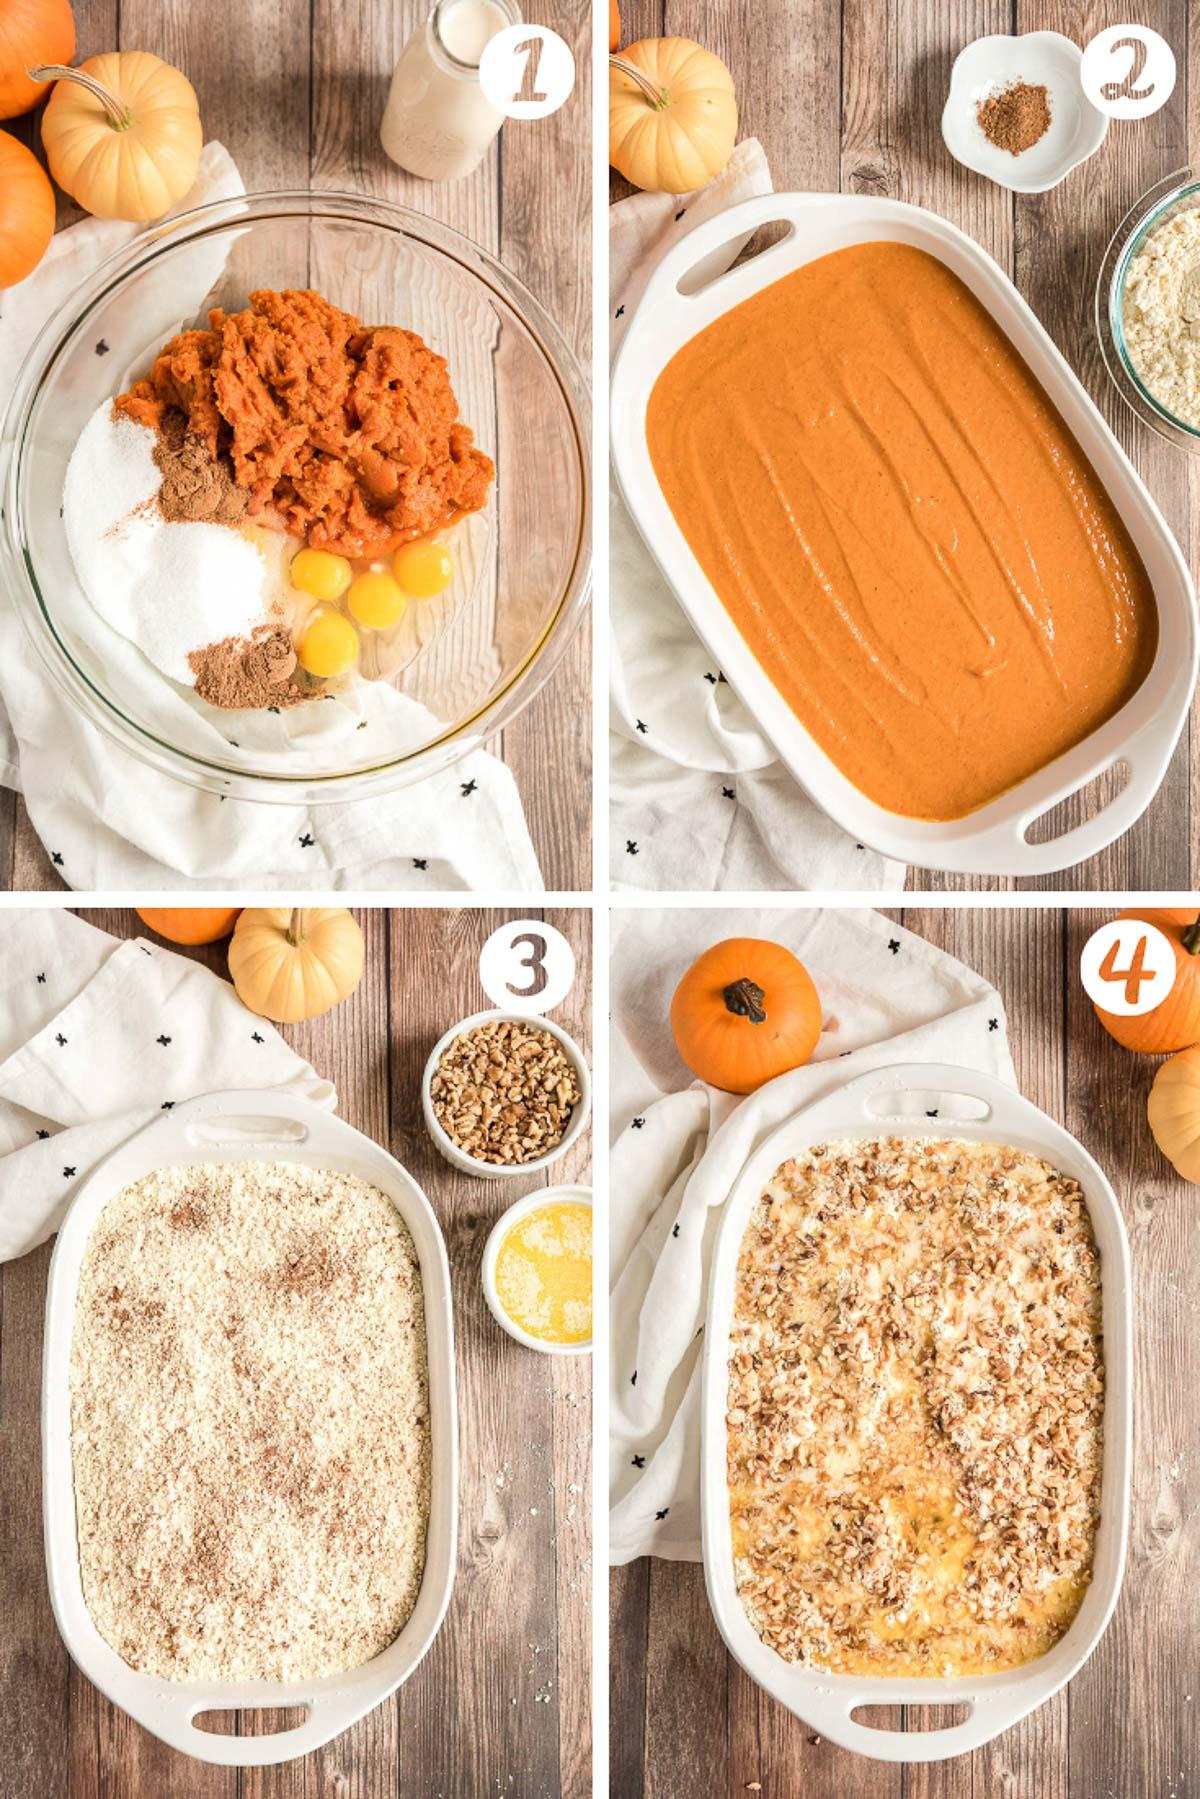 step-by-step photos of how to make pumpkin dump cake.